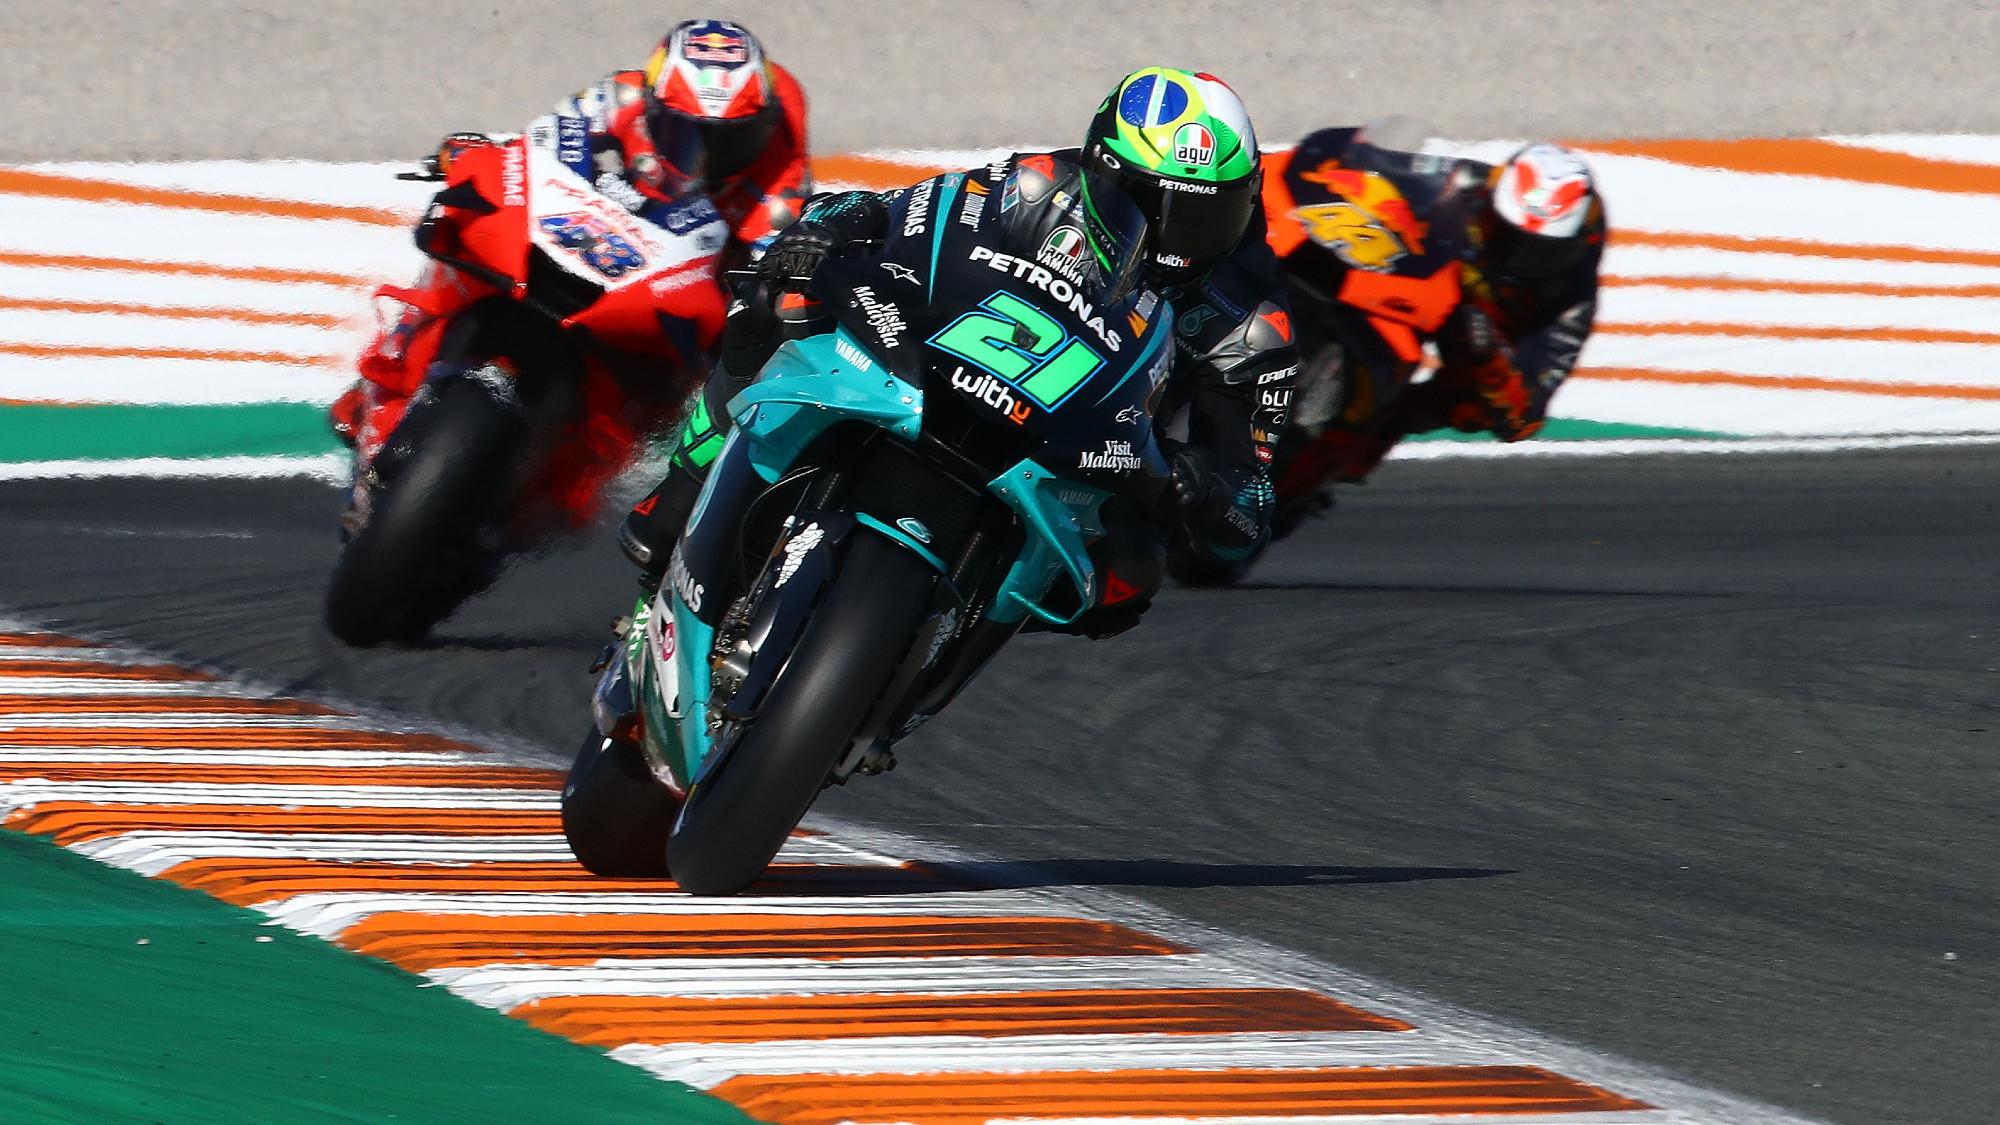 Valencia MotoGP: Morbidelli's engine miracle, Yamaha's nightmare continues